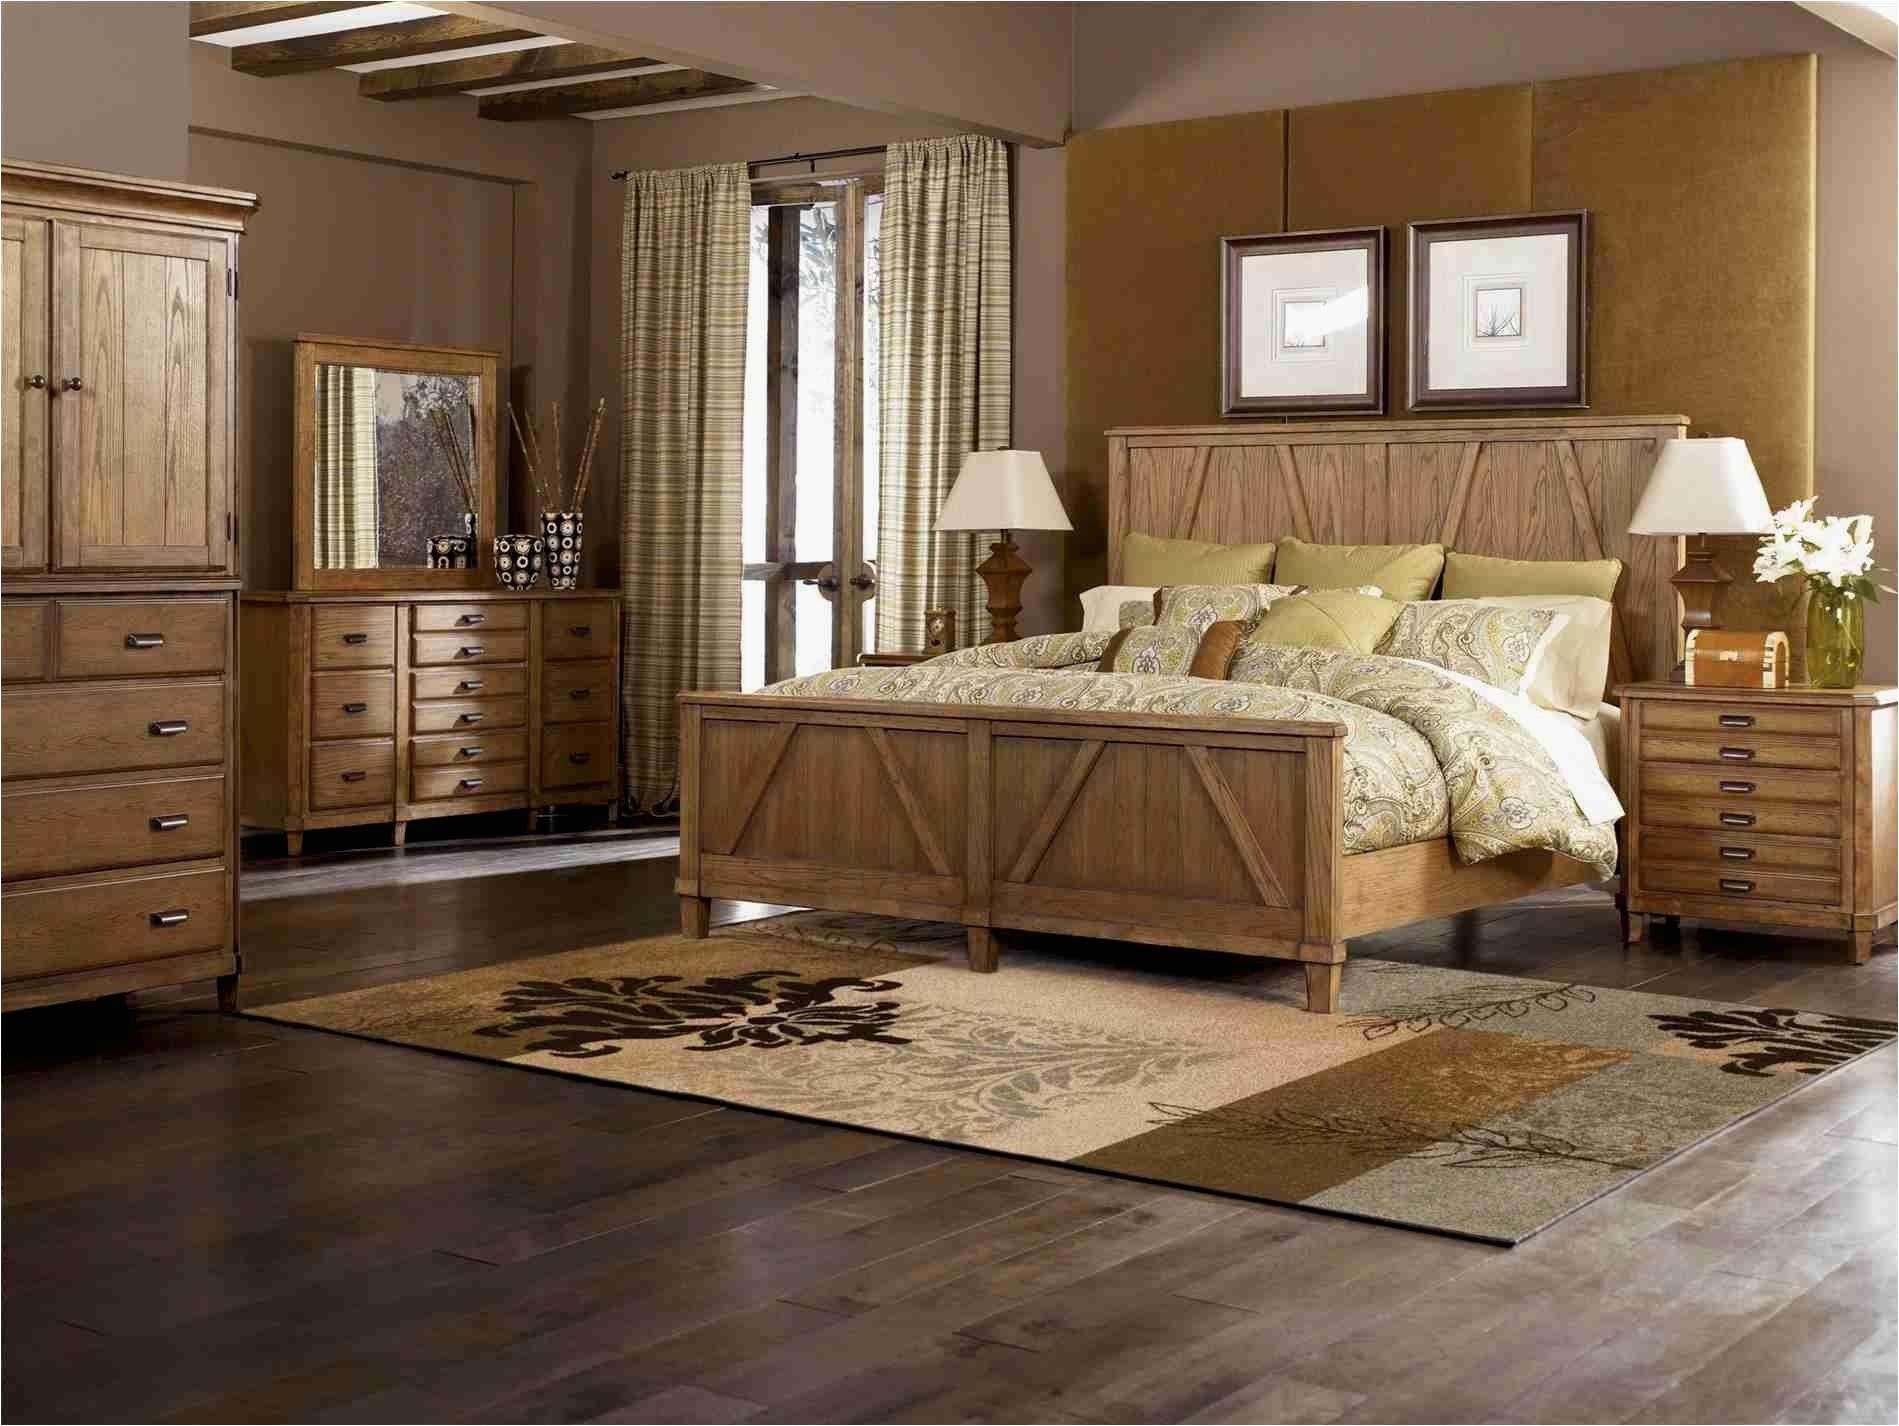 rustic furniture san antonio tx best of rustic bedroom furniture bowry reclaimed wood bed trinell piece